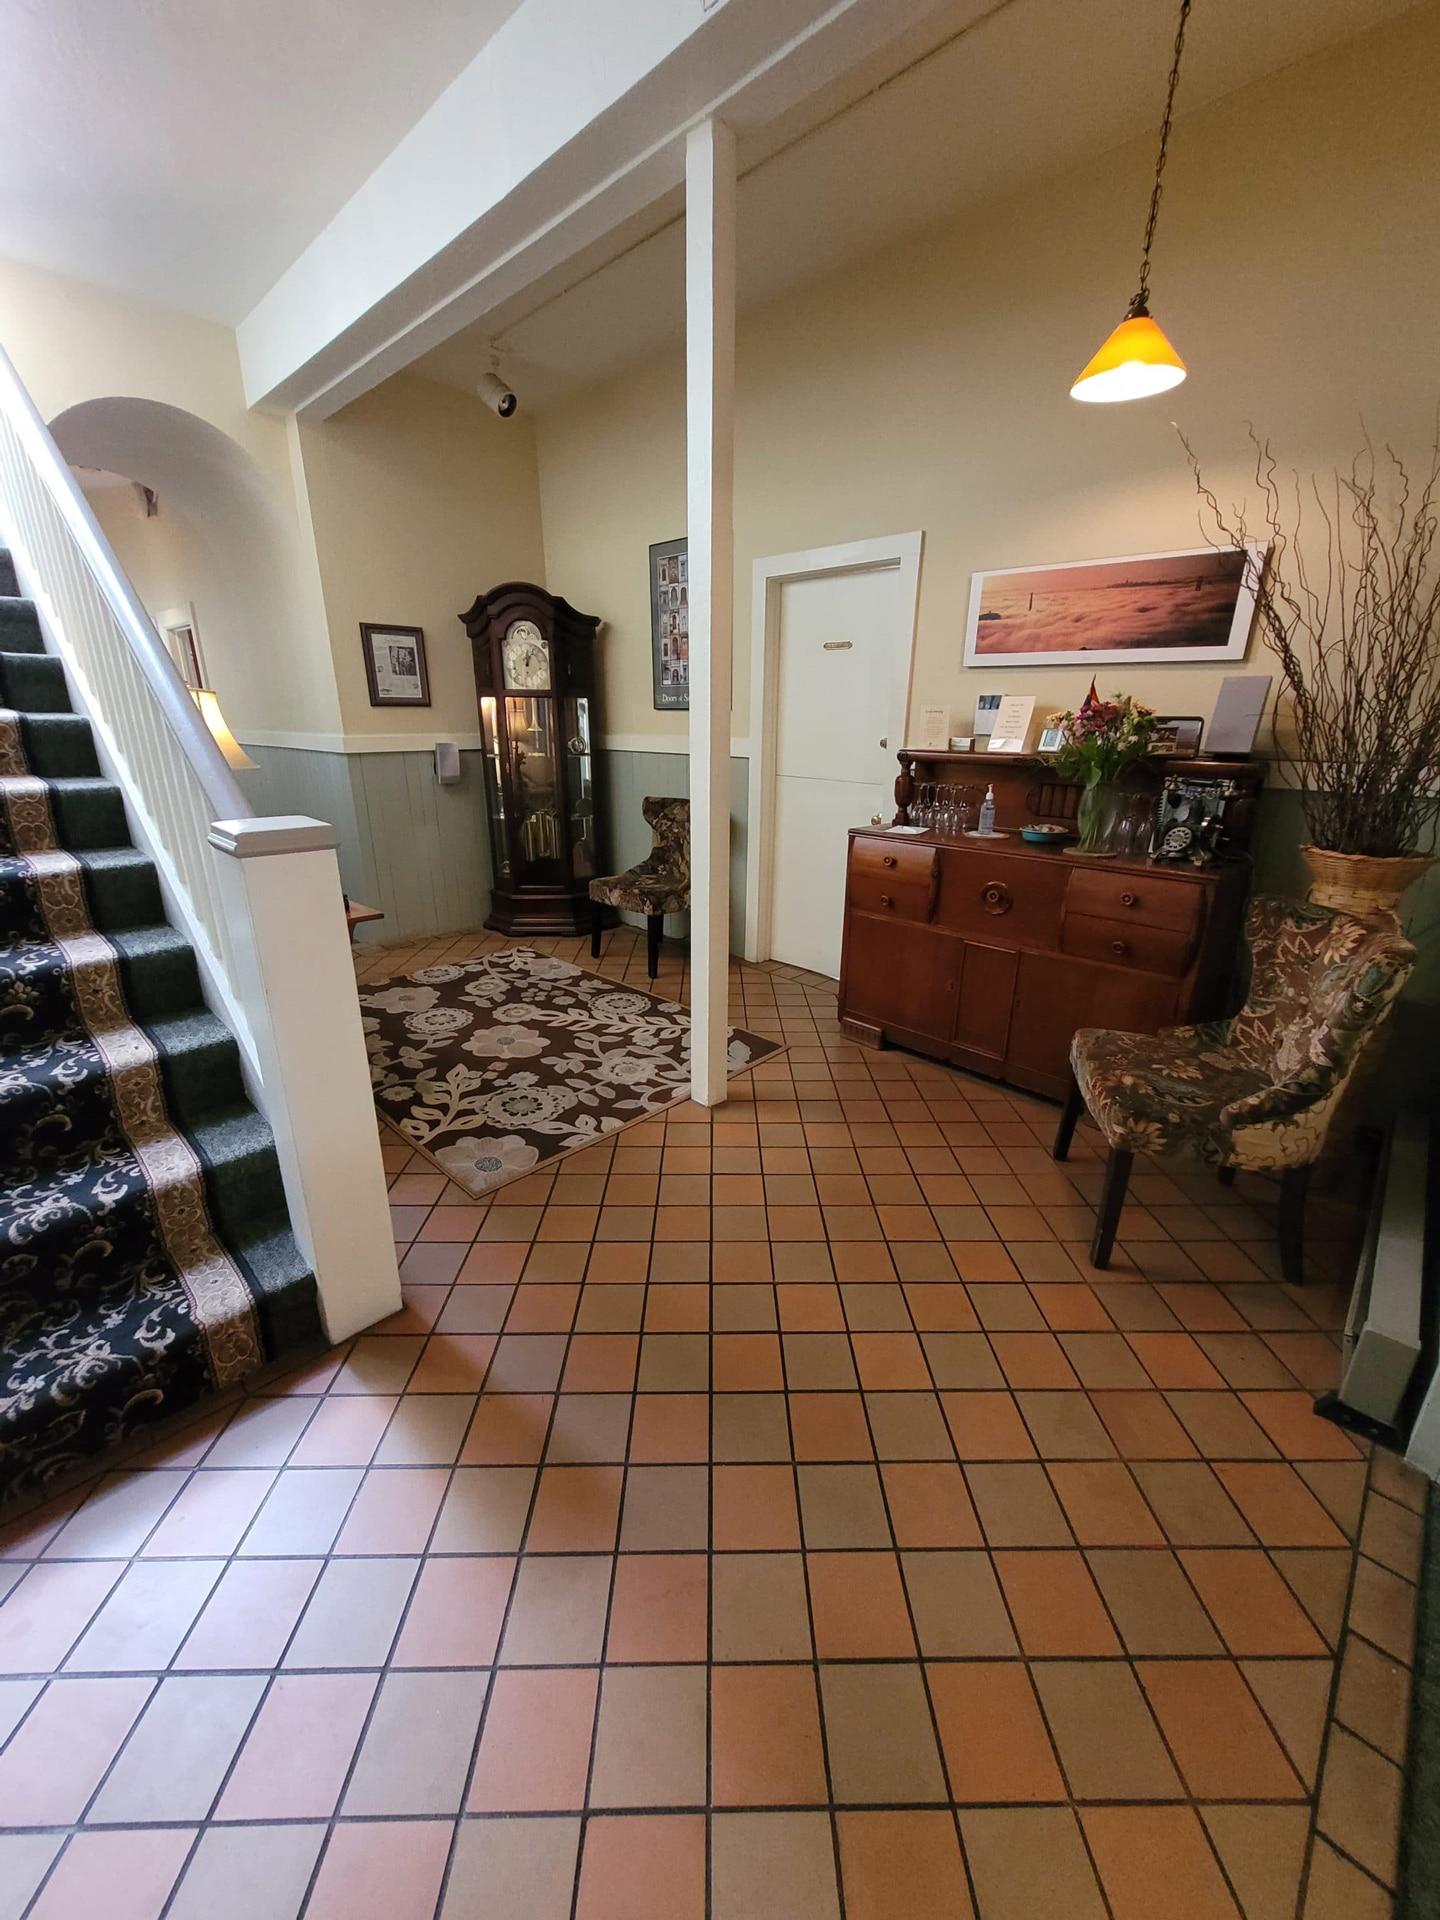 About The Willows Inn, Charming, European-Style San Francisco B&B